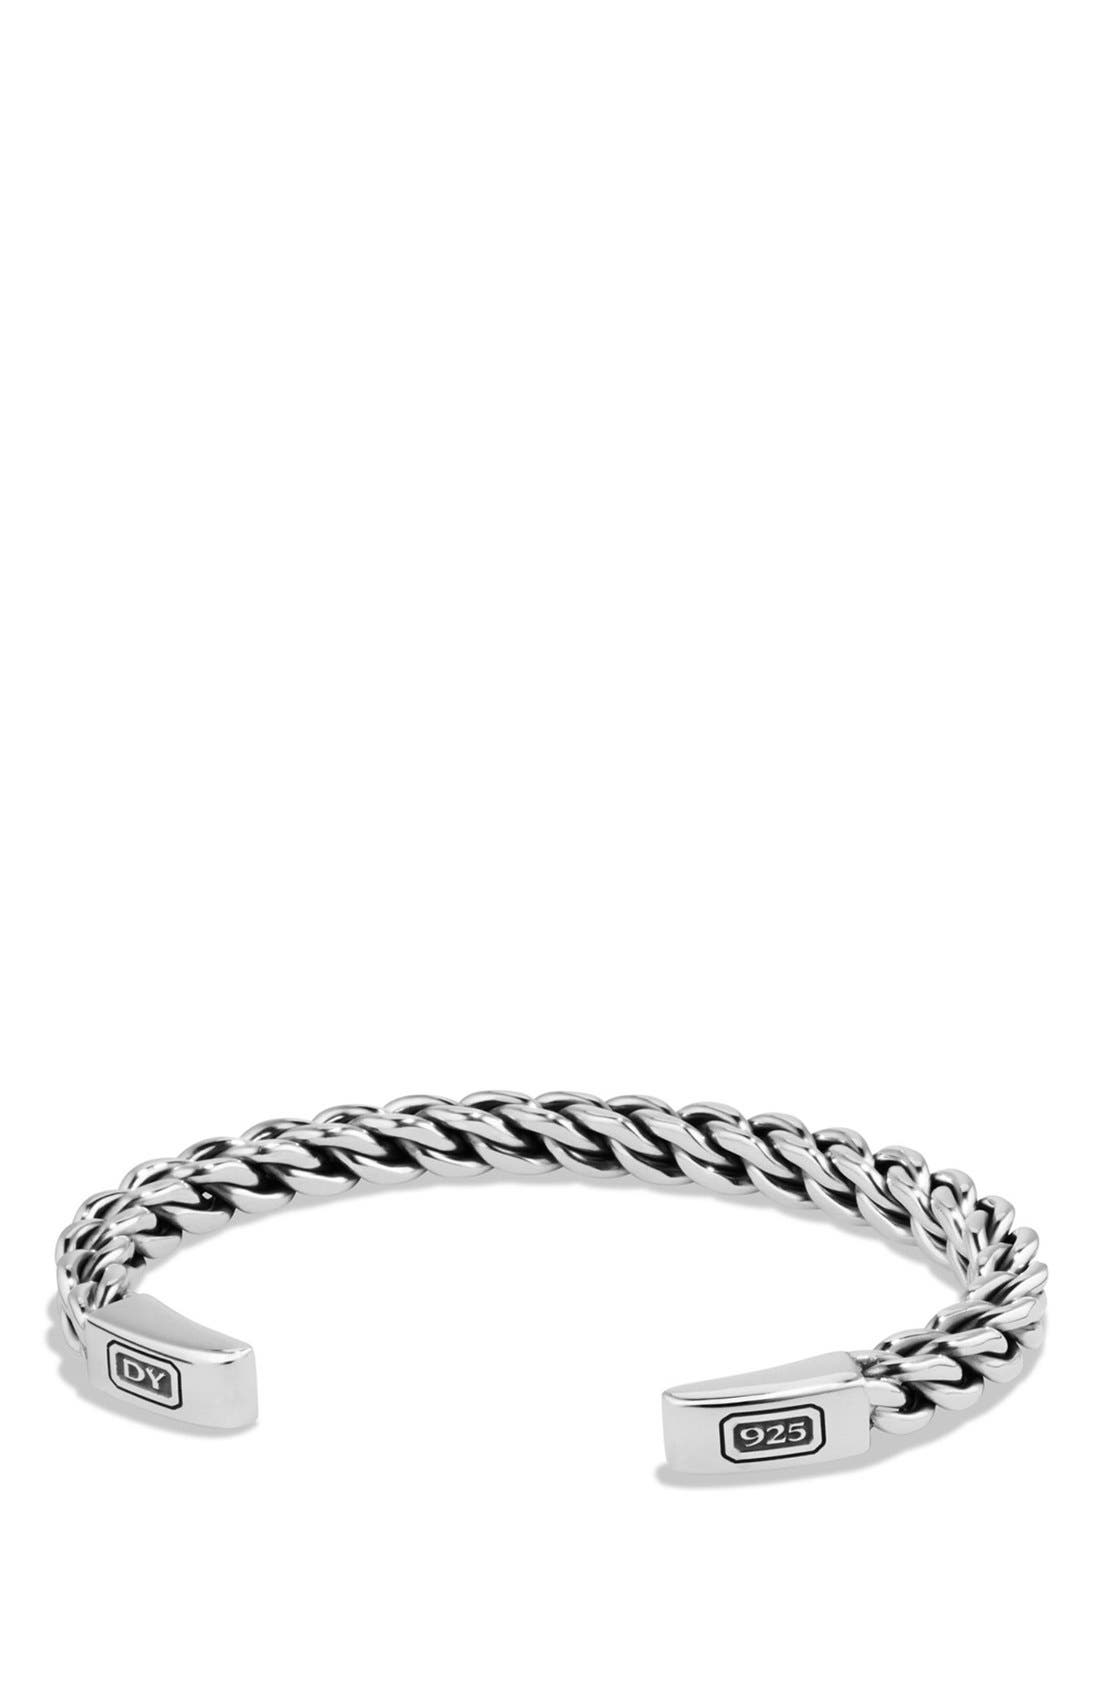 'Chain' Woven Cuff Bracelet,                             Main thumbnail 1, color,                             SILVER